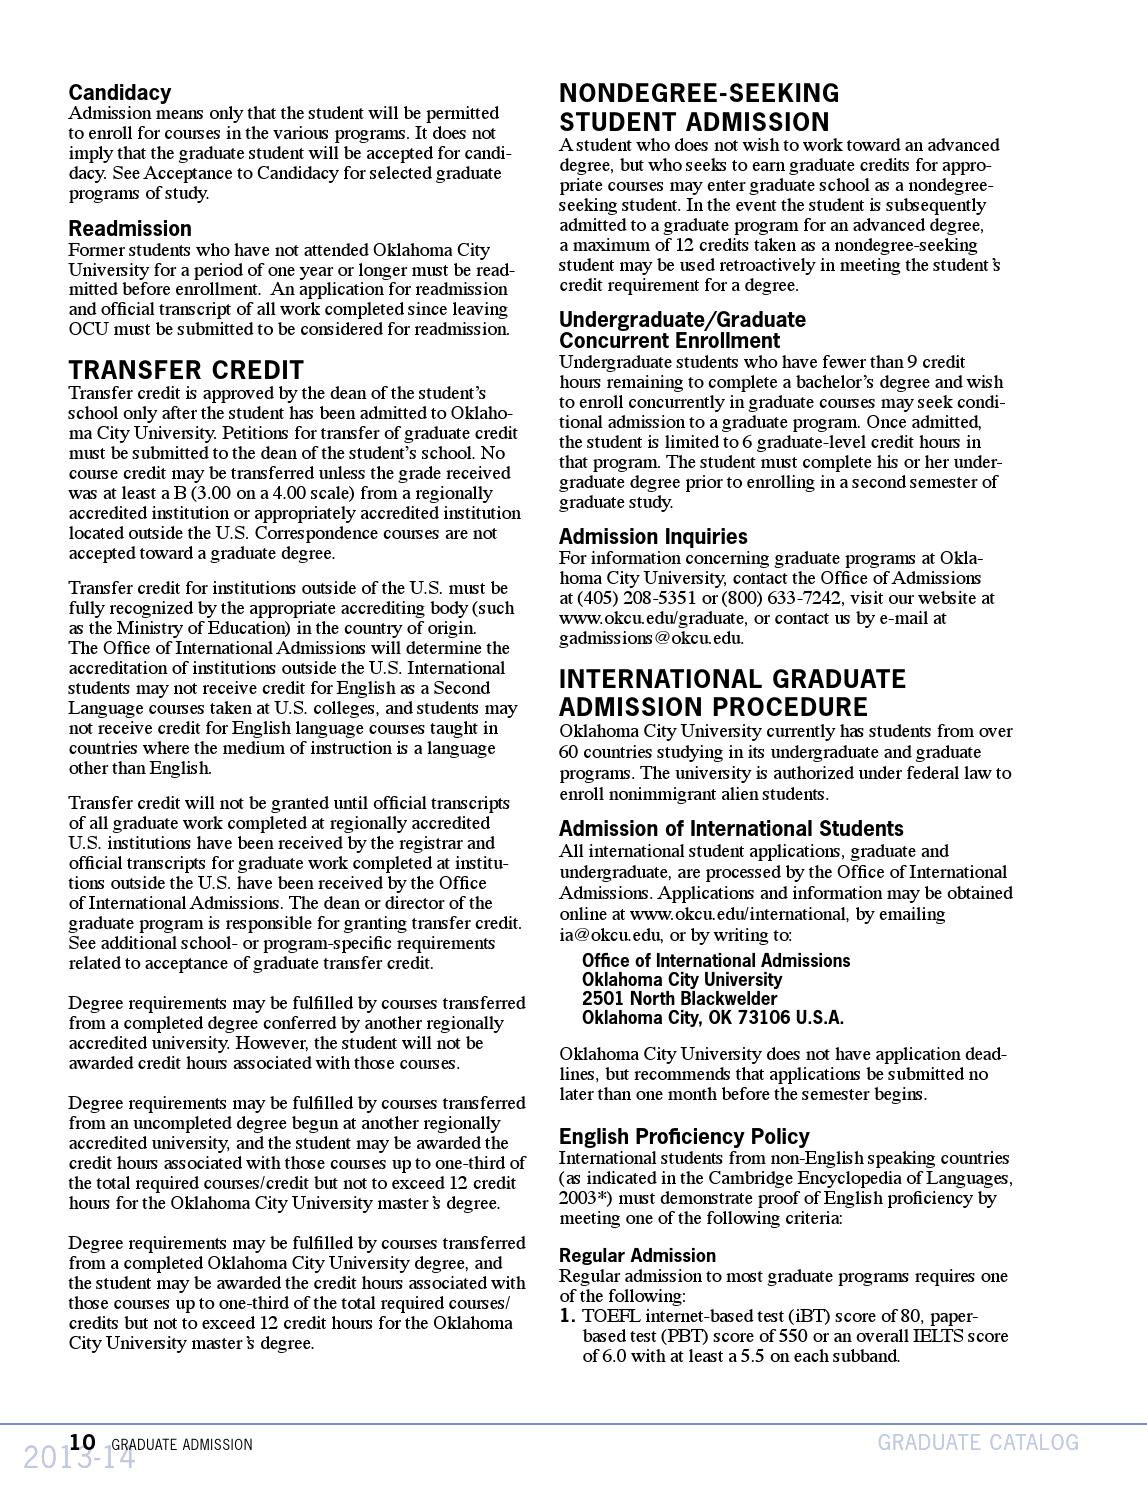 Ocu Graduate Catalog 2013 2014 By Oklahoma City University Issuu